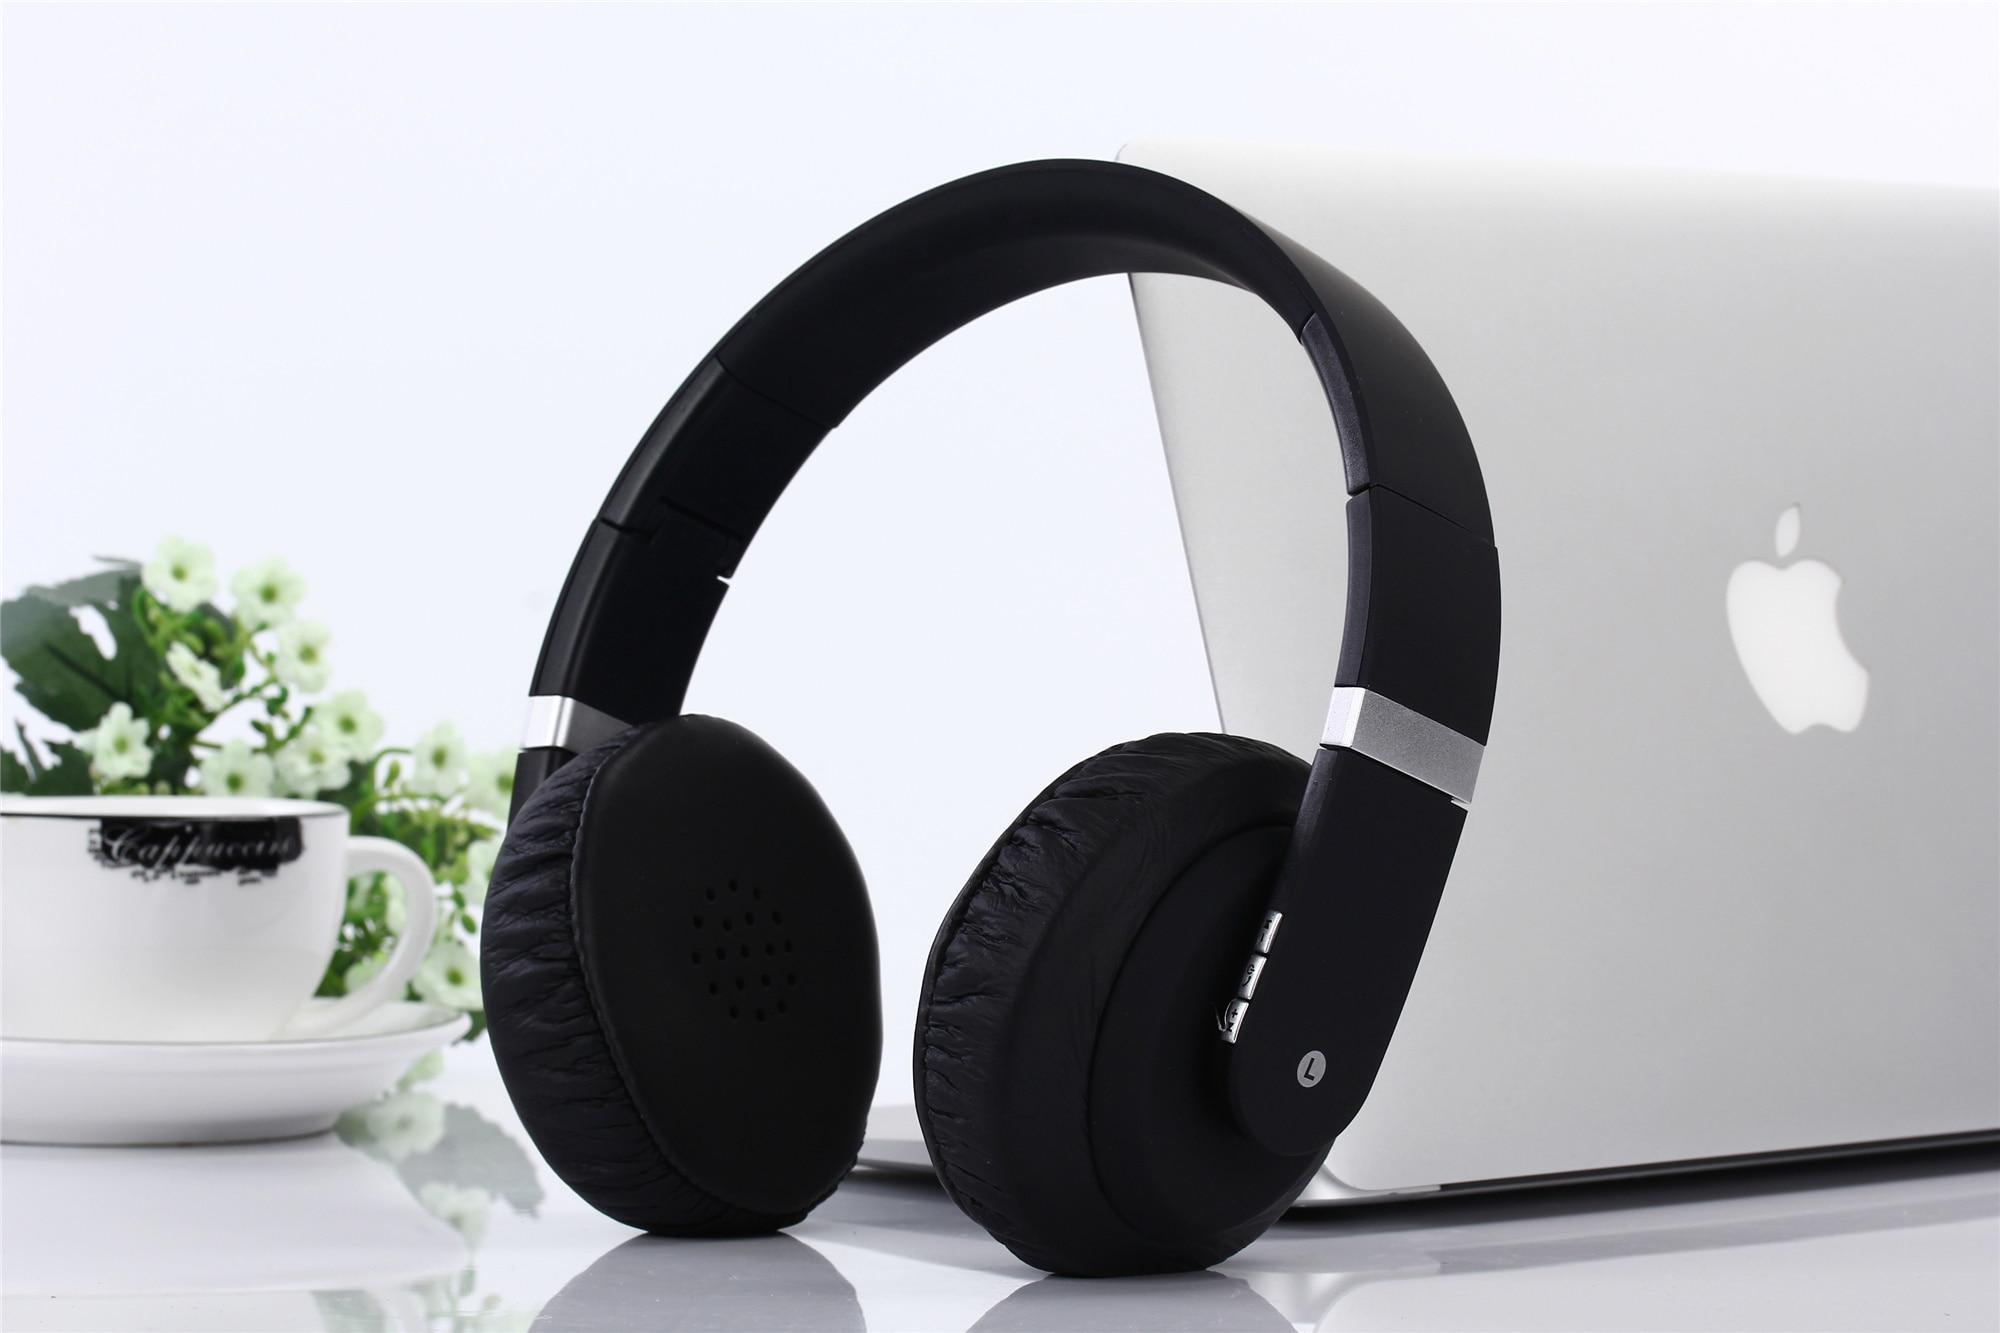 Symrun Port Mic Handsfree for Phone BT1602 Wireless Bluetooth Headphones Foldable Bluetooth Headset Portable Earphone with 3.5MM favourite 1602 1f